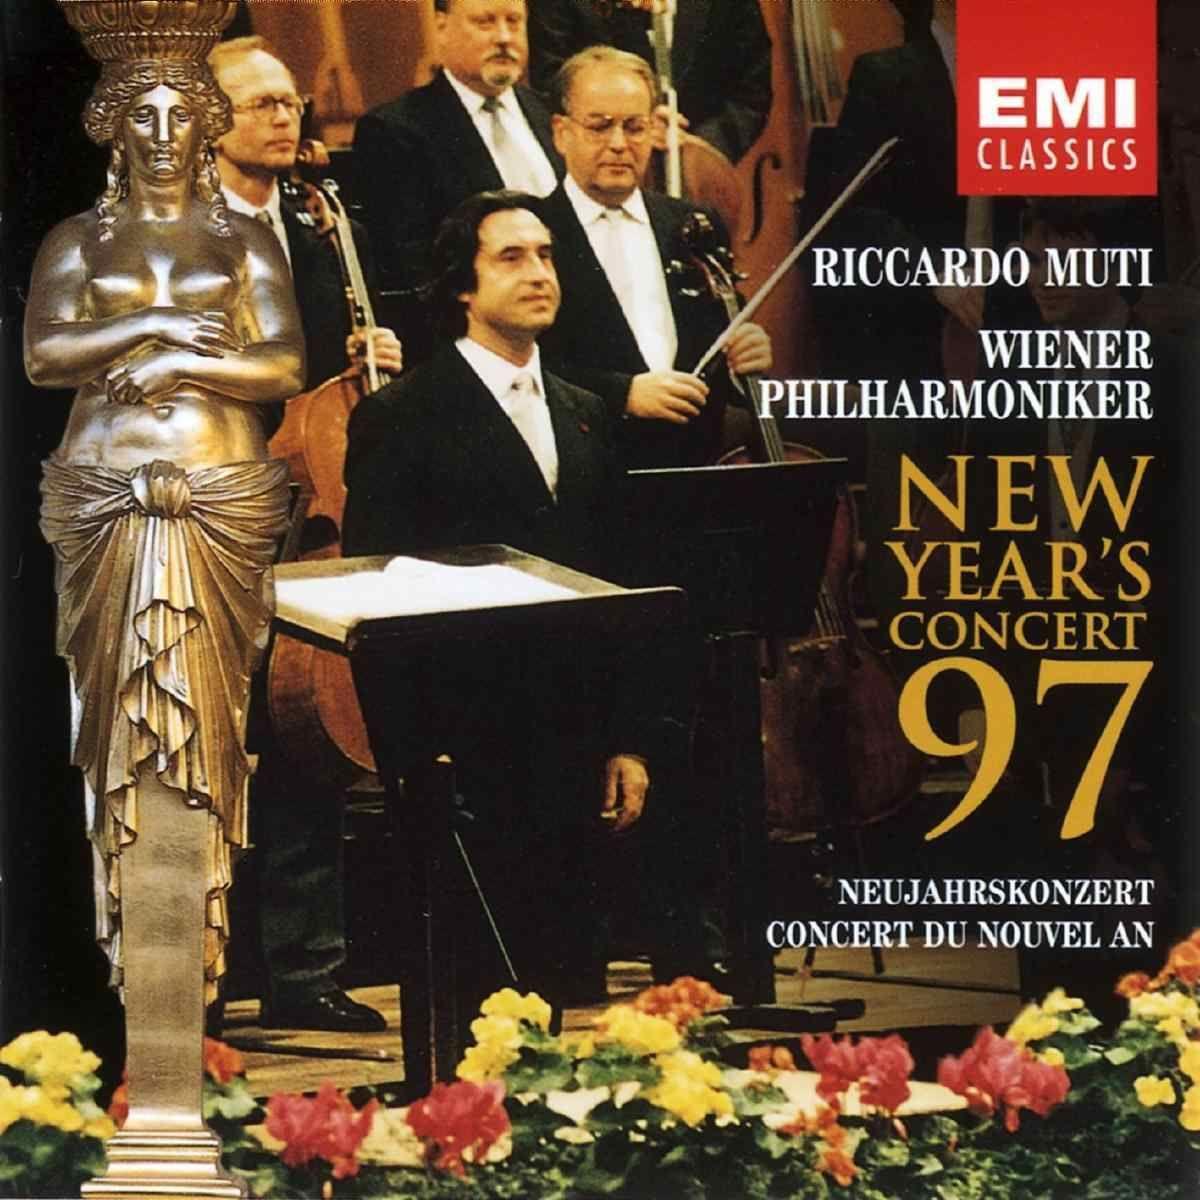 Russischer Marsch Op 426 By Georges Pretre Wiener Philharmoniker New Year Concert Wiener Music Search